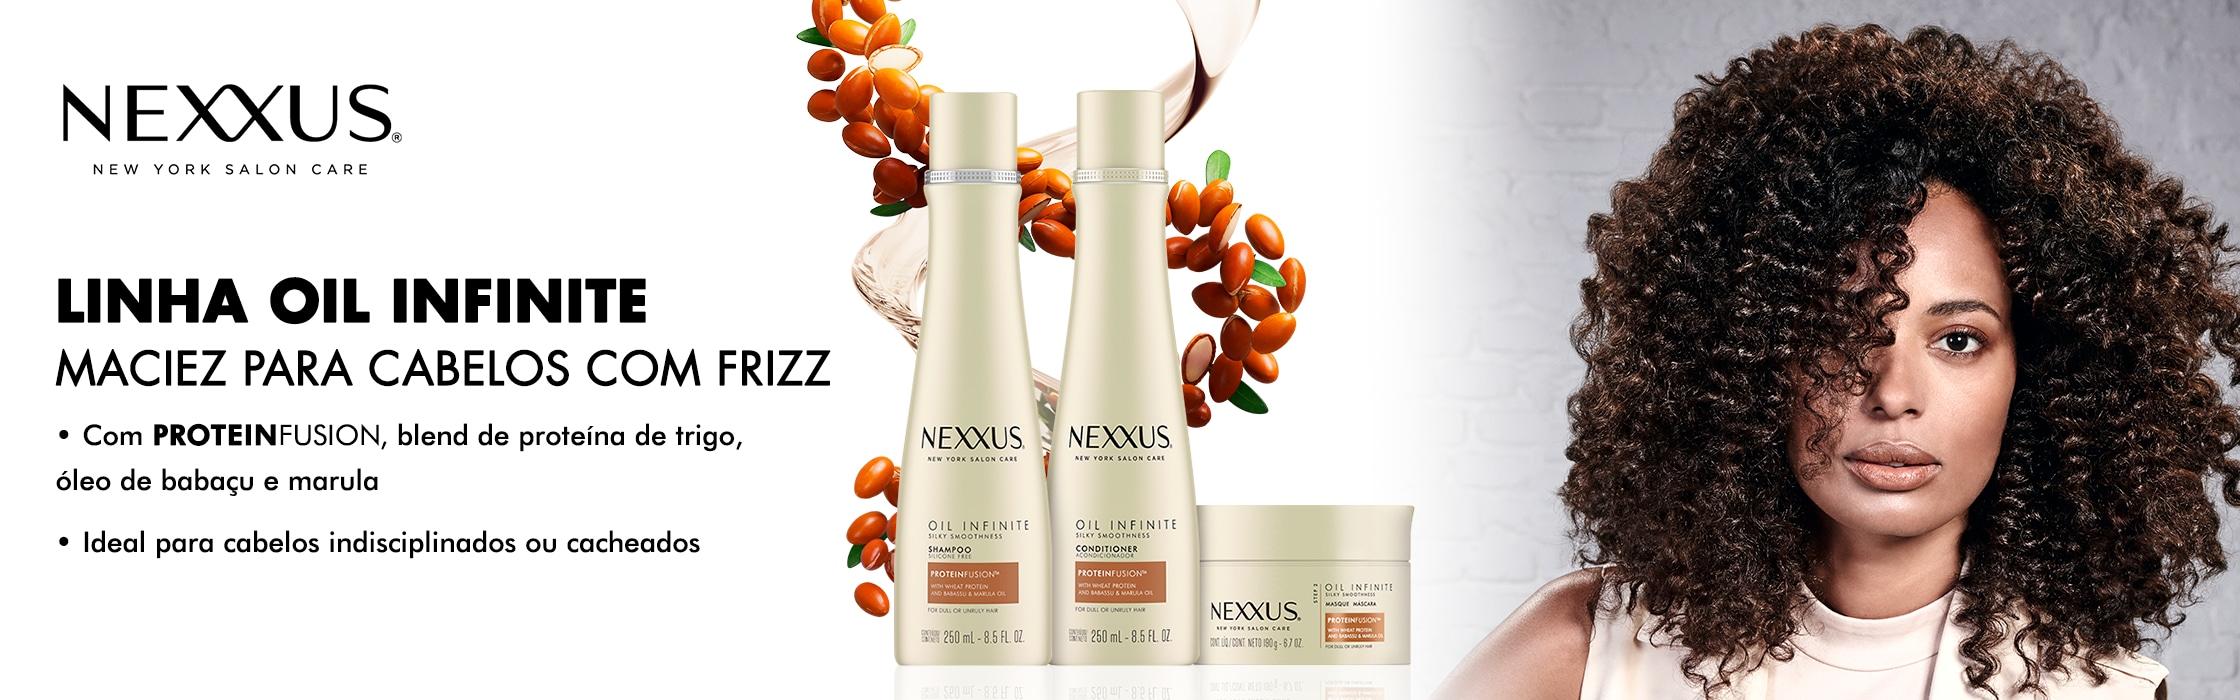 Nexxus Oil Infinite